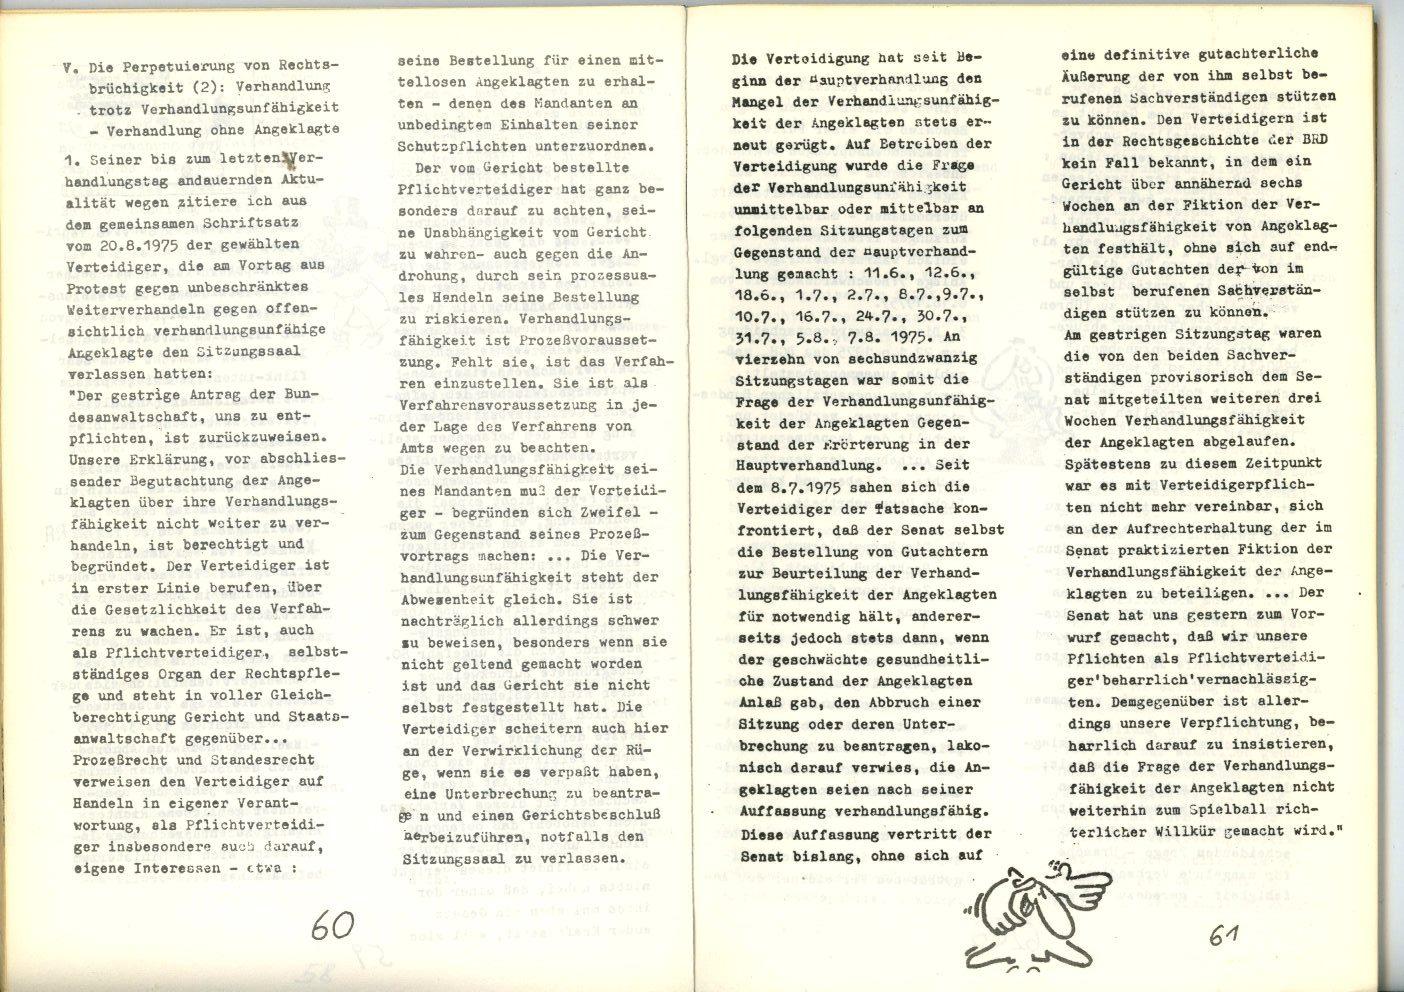 Marburg_Russell_Initiative_1978_32